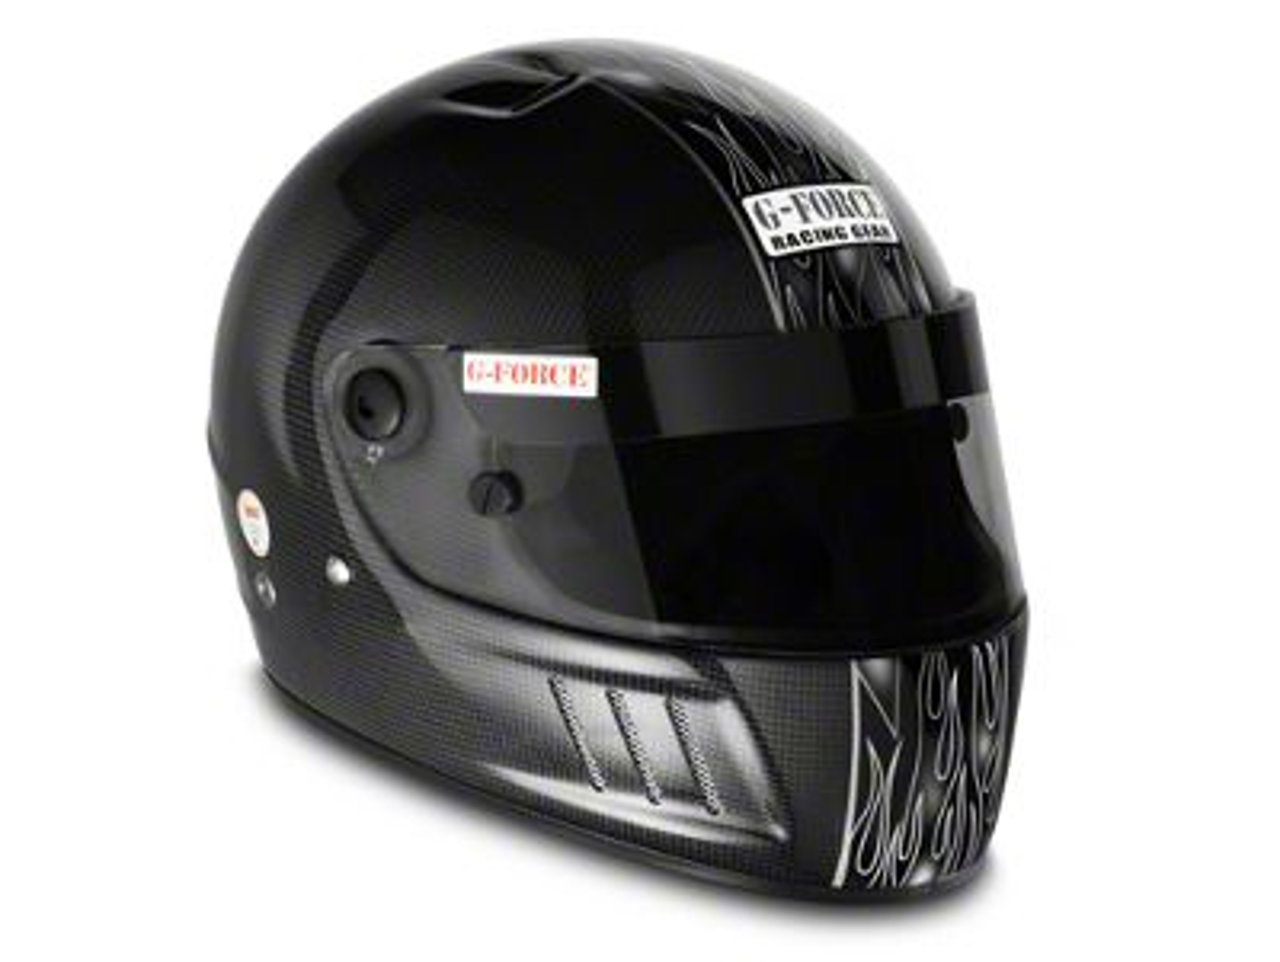 G-Force CFG Carbon Fiber Helmet